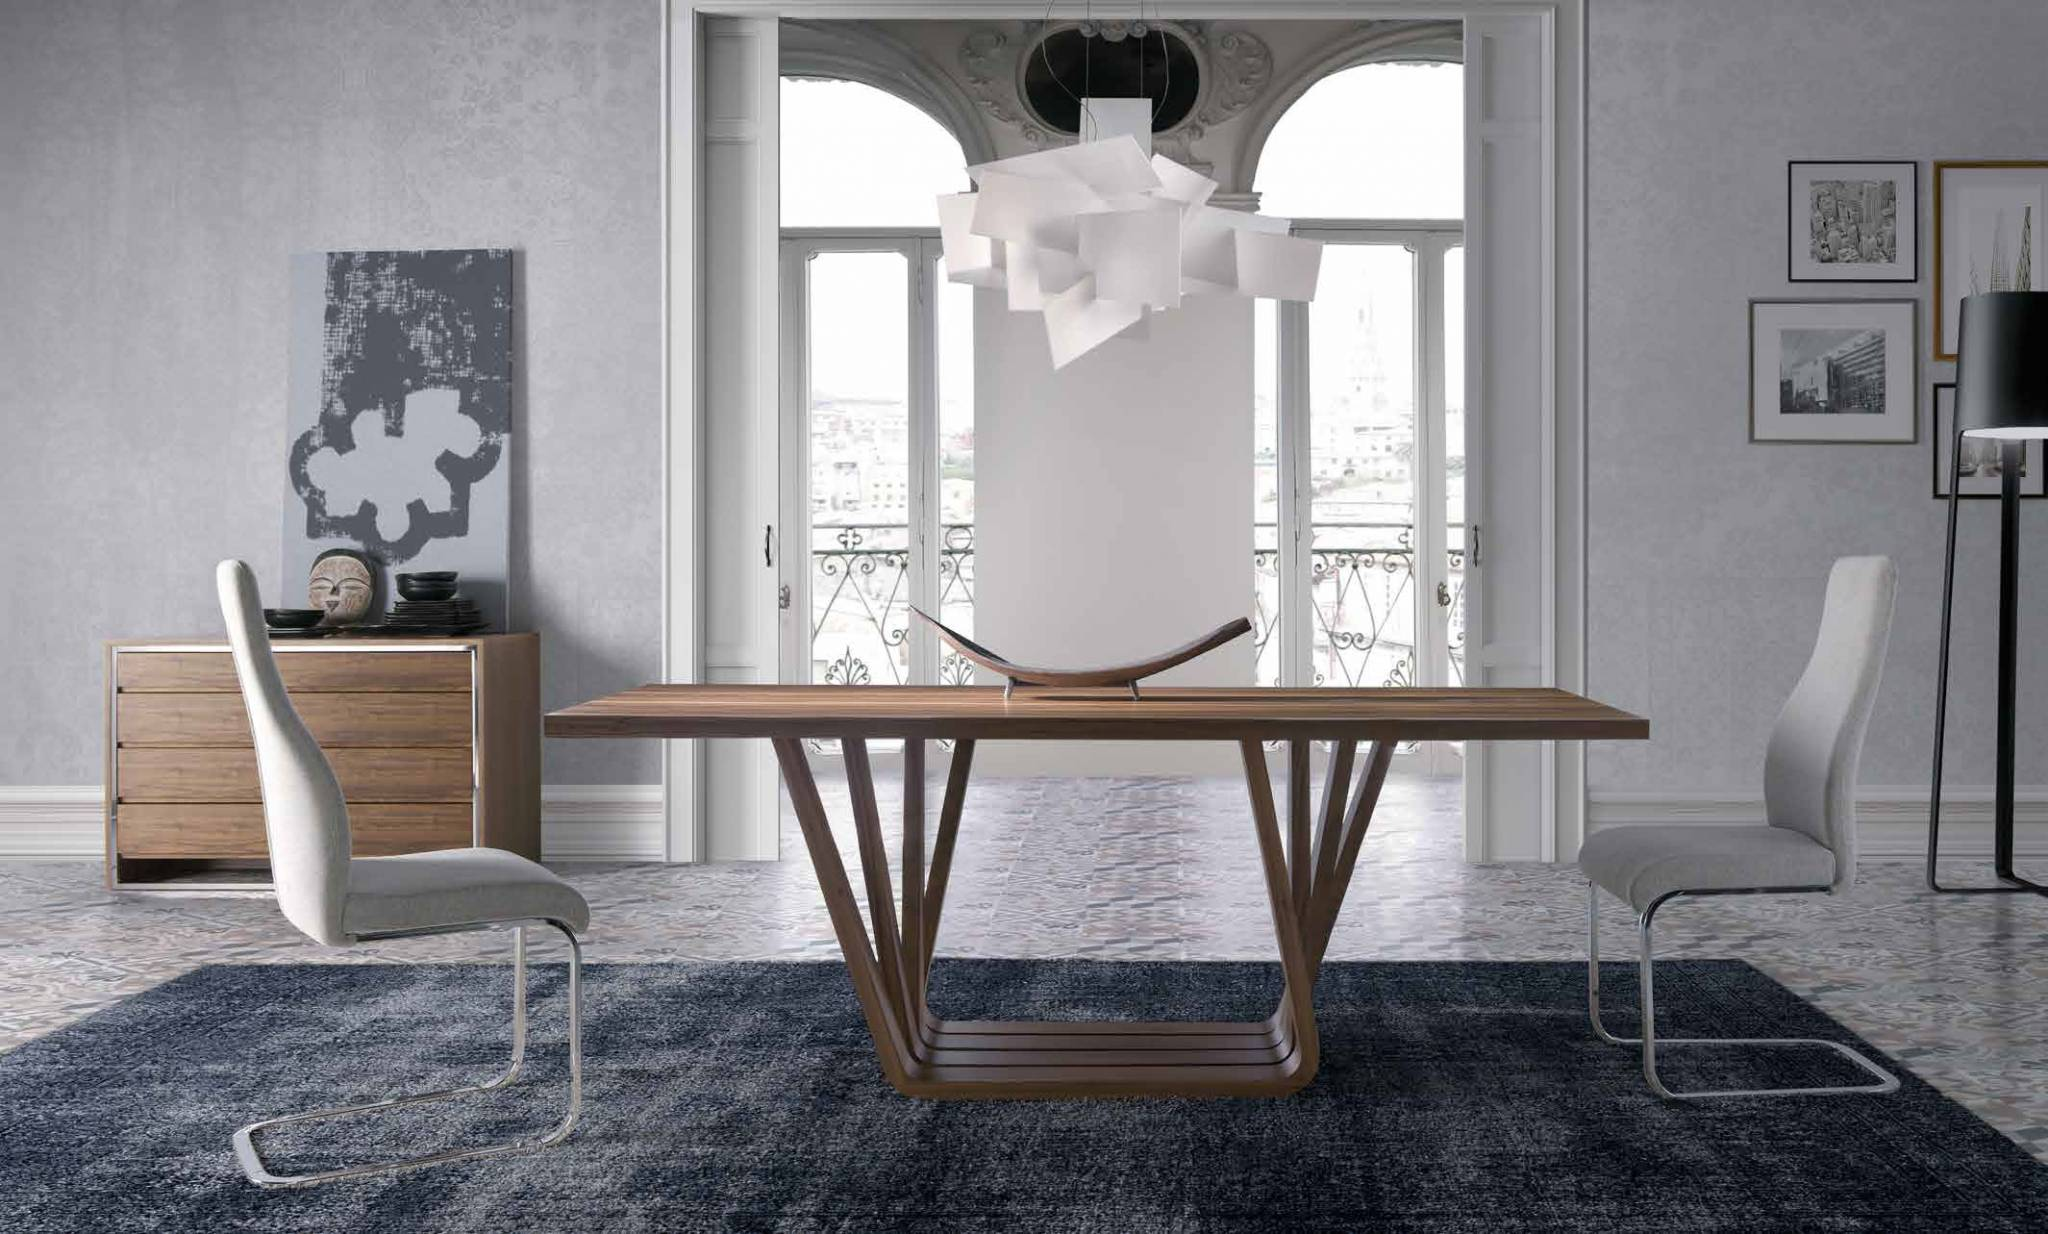 Mesa edor Moderna Parma Muebles D azMuebles D az